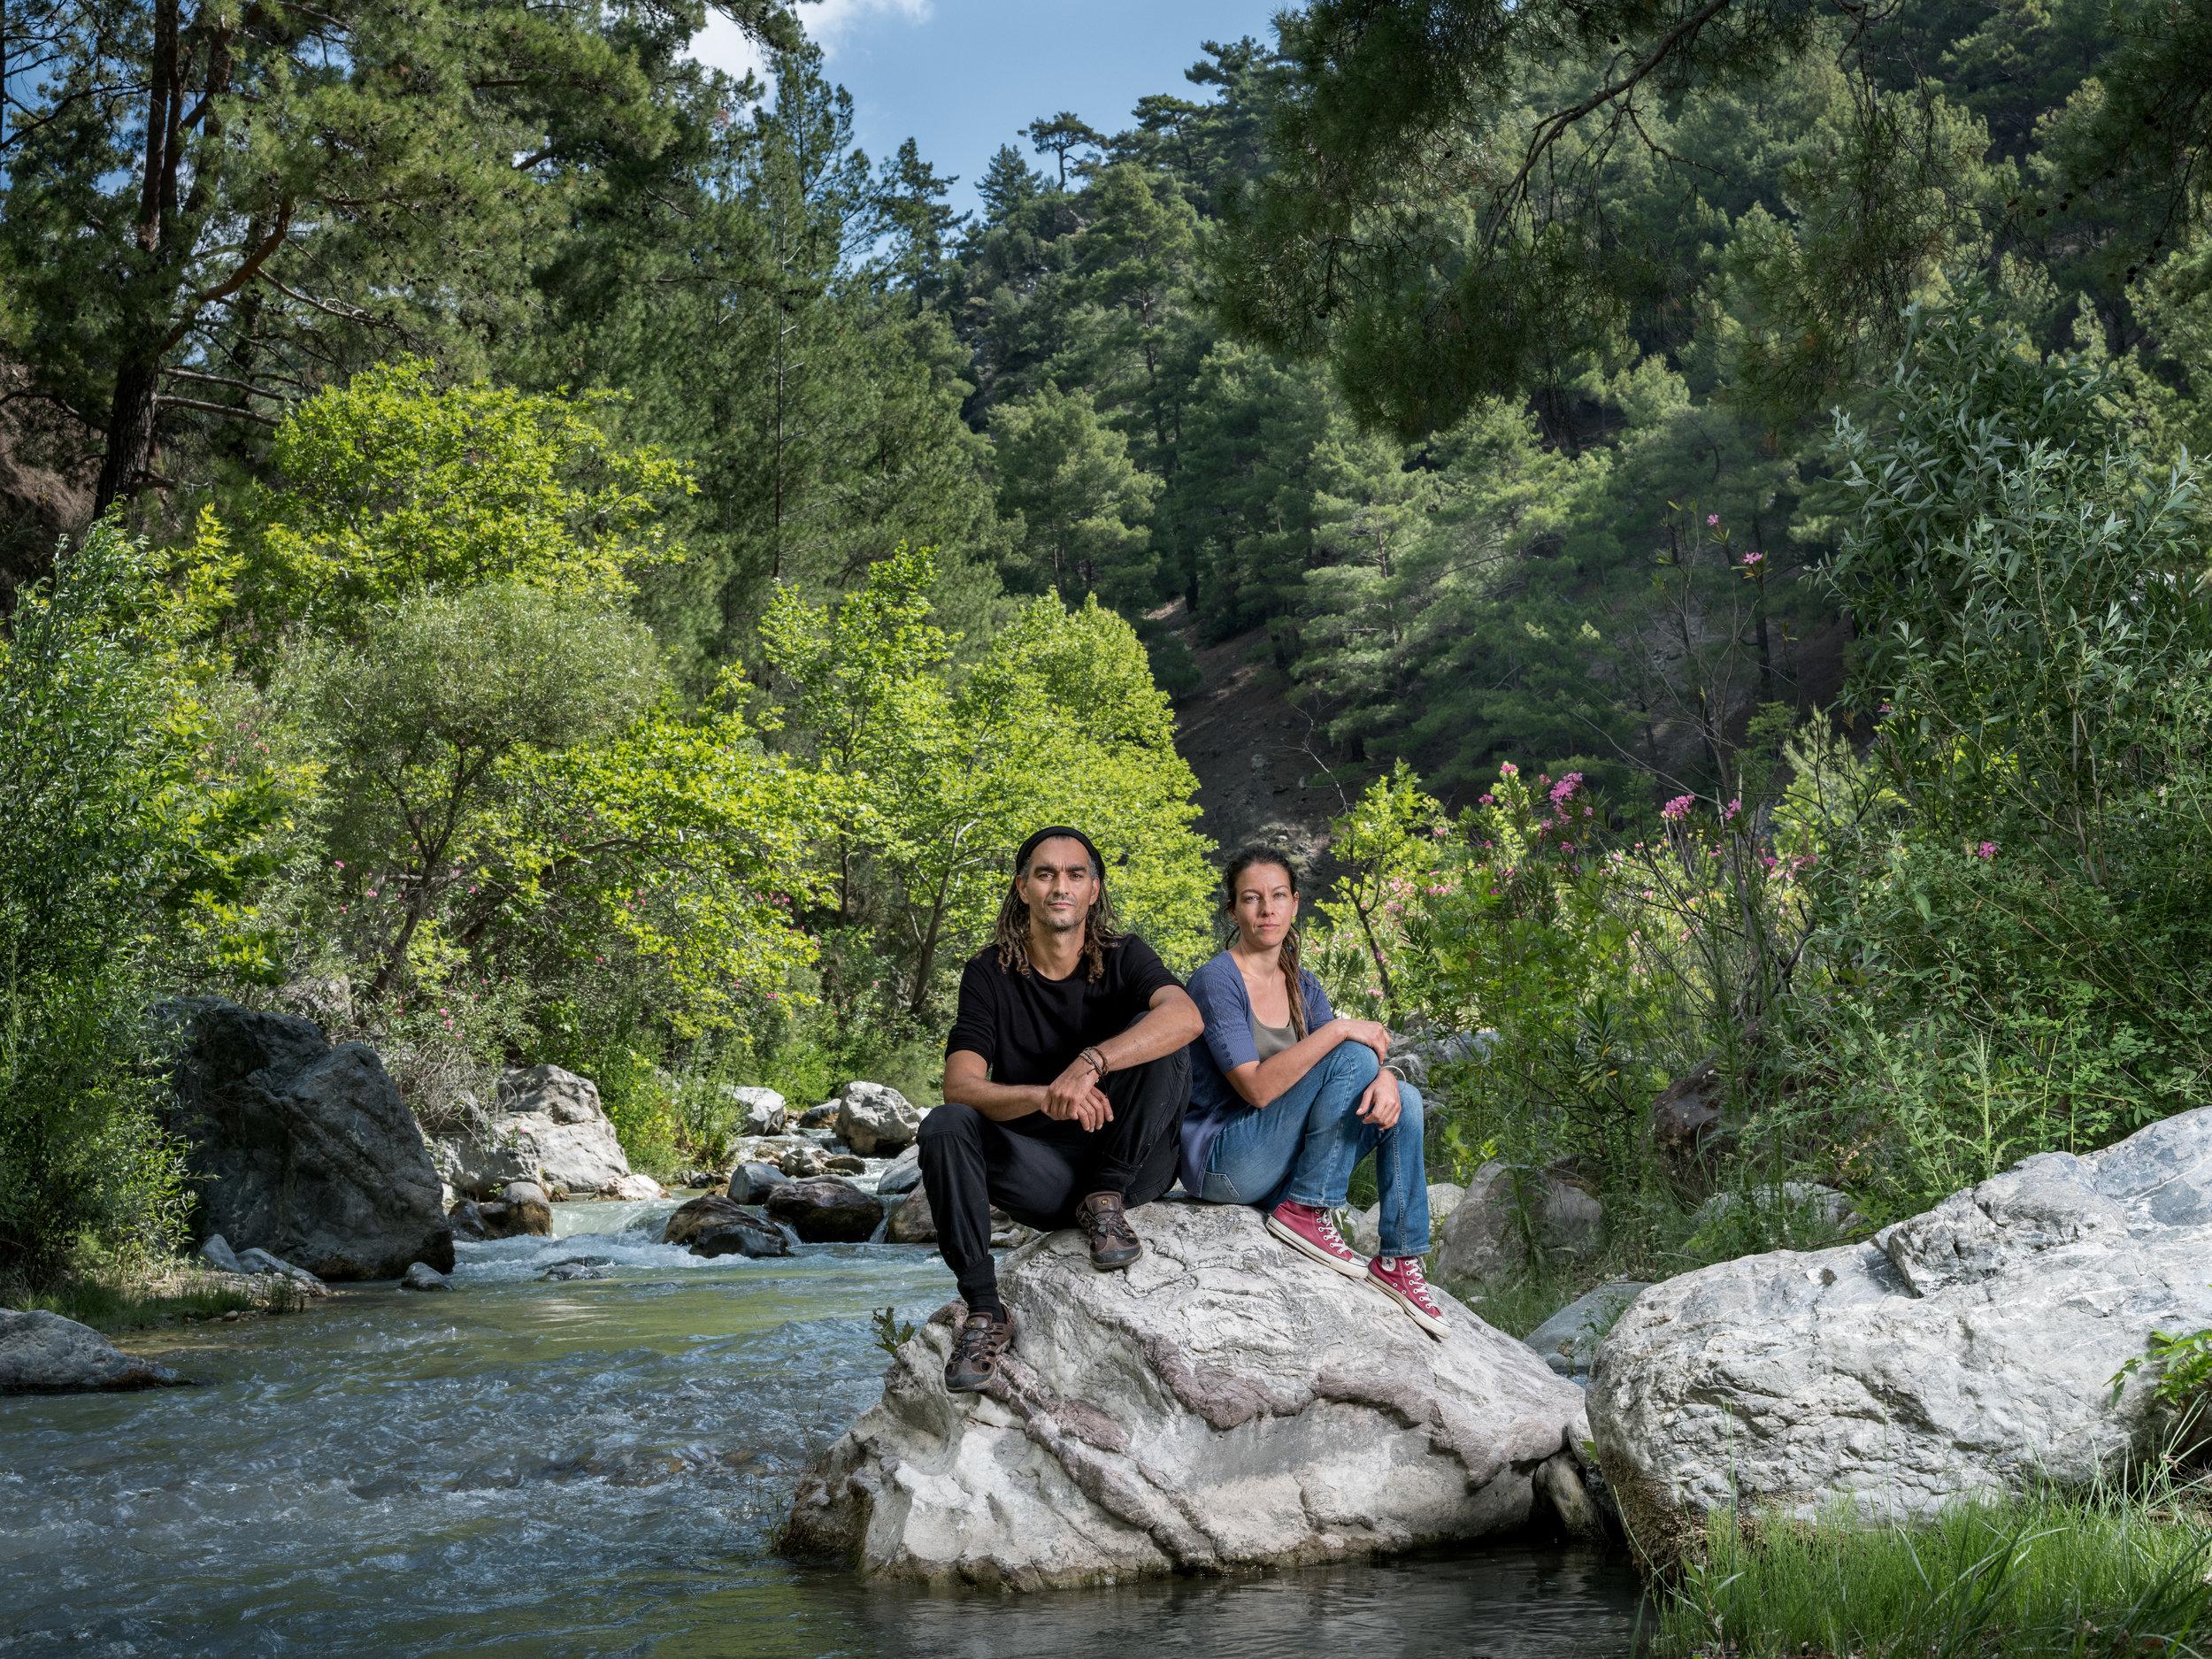 Birhan Erkutlu & Tugba Günal at the river that runs by their property